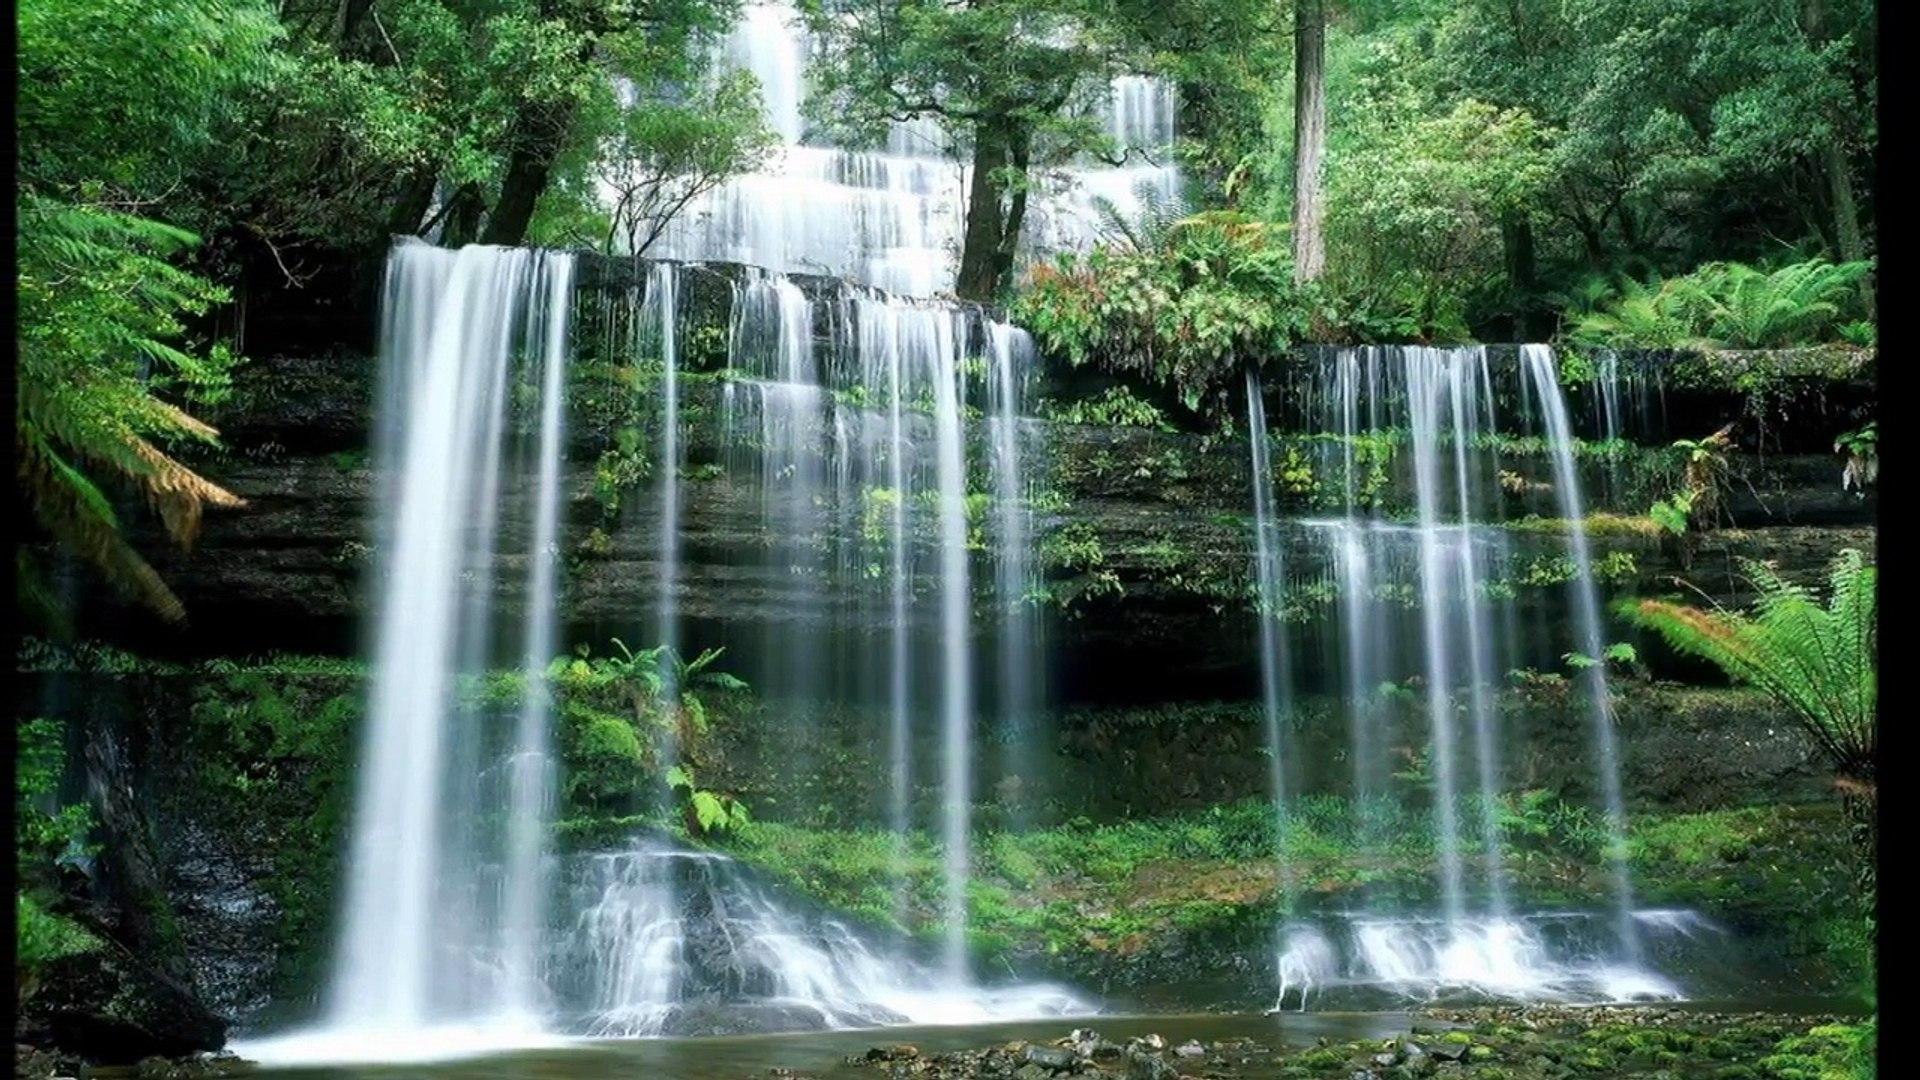 Paisaje Sonoro: Cascada de Agua (SP)